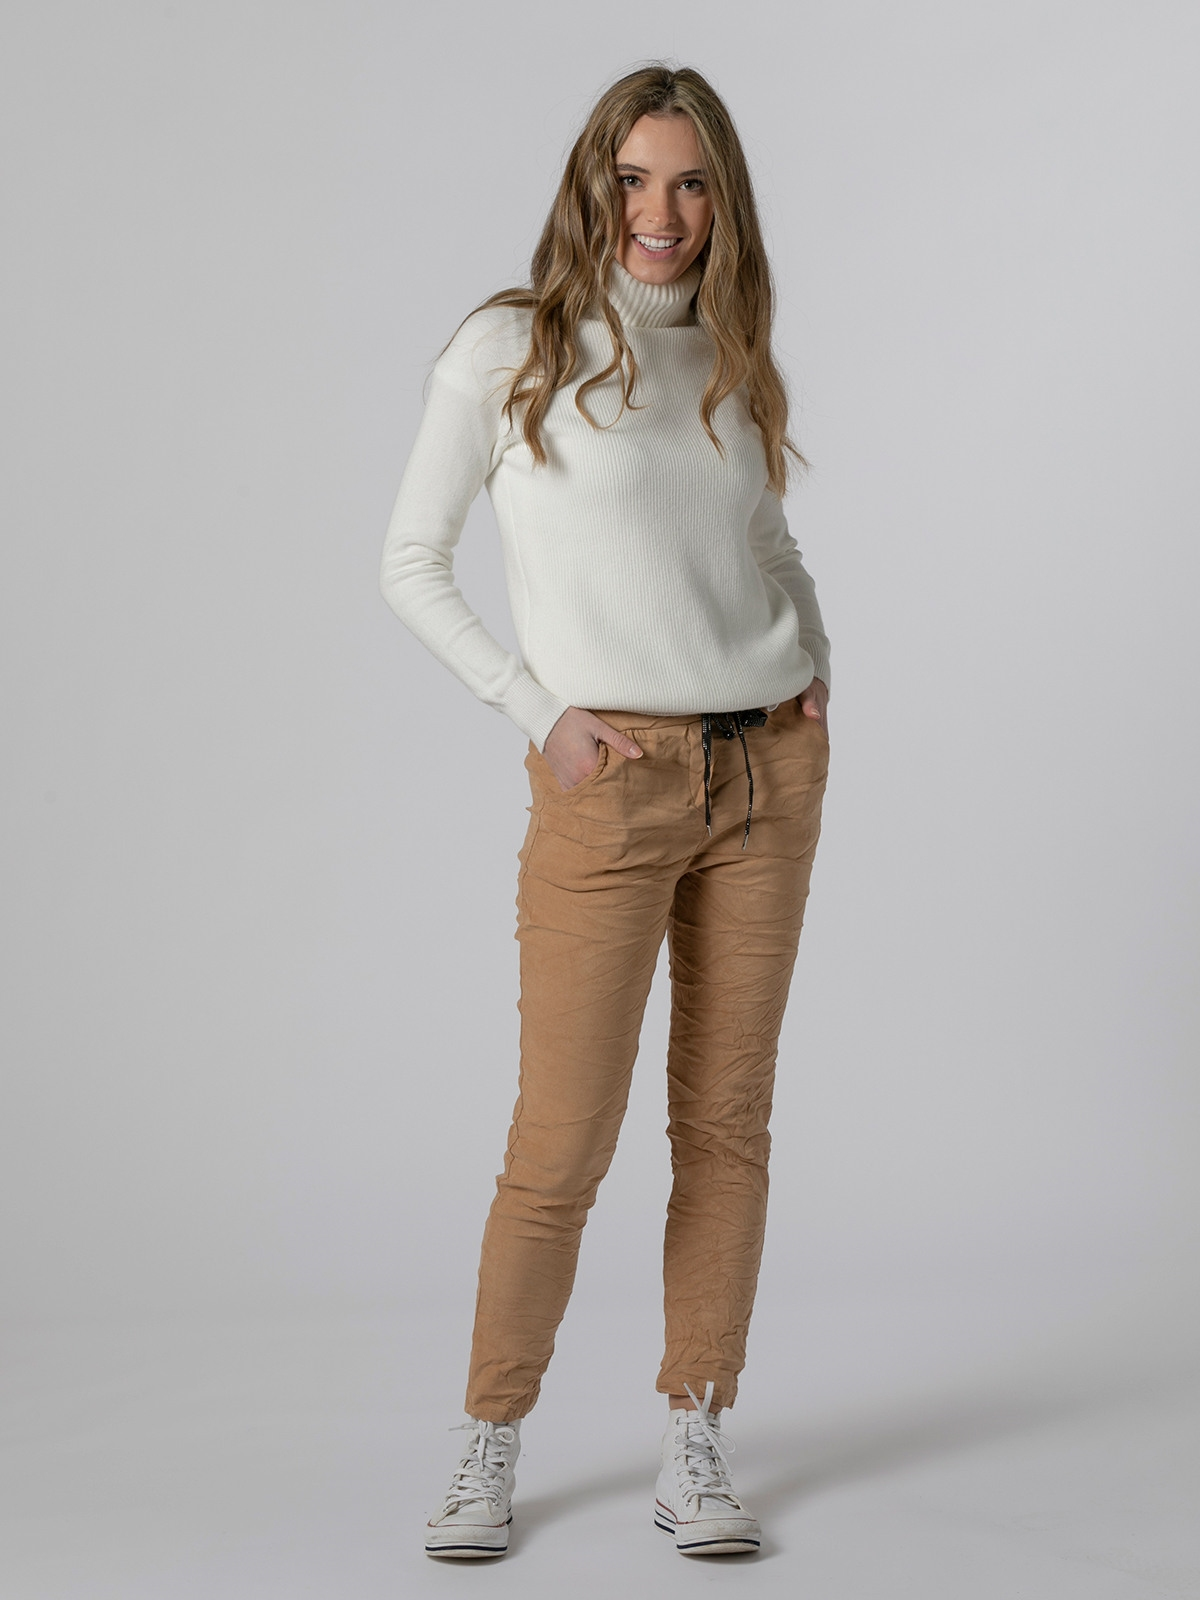 Pantalón mujer sport goma tinte ecológico Beige